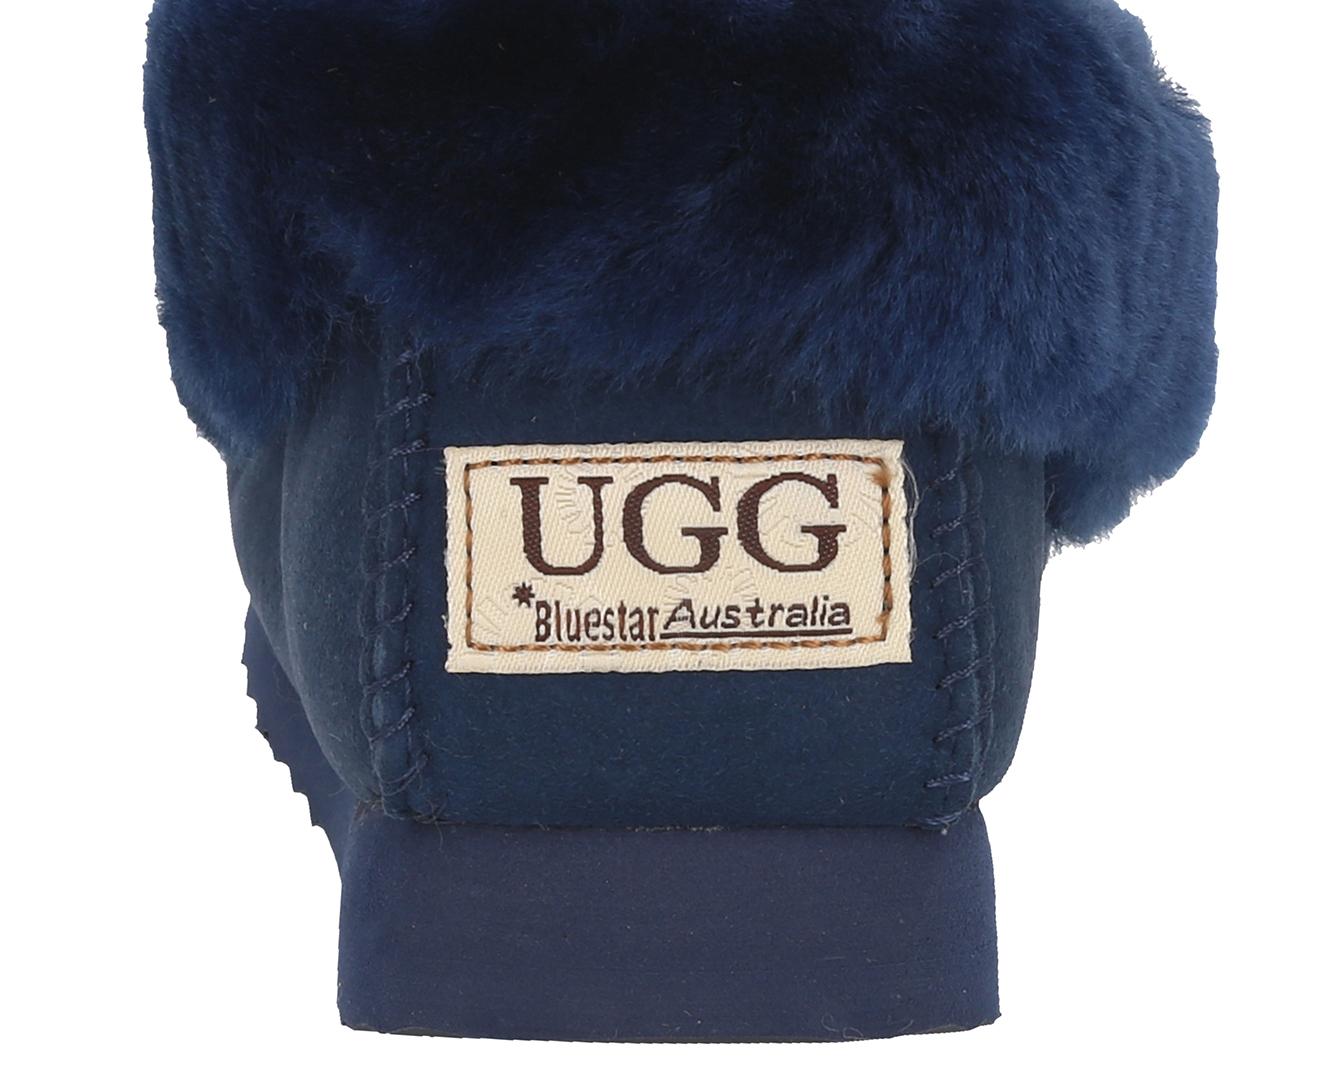 50e94cf6525 Bluestar Women's Premium Australian Sheepskin Ugg Moccasin - Navy